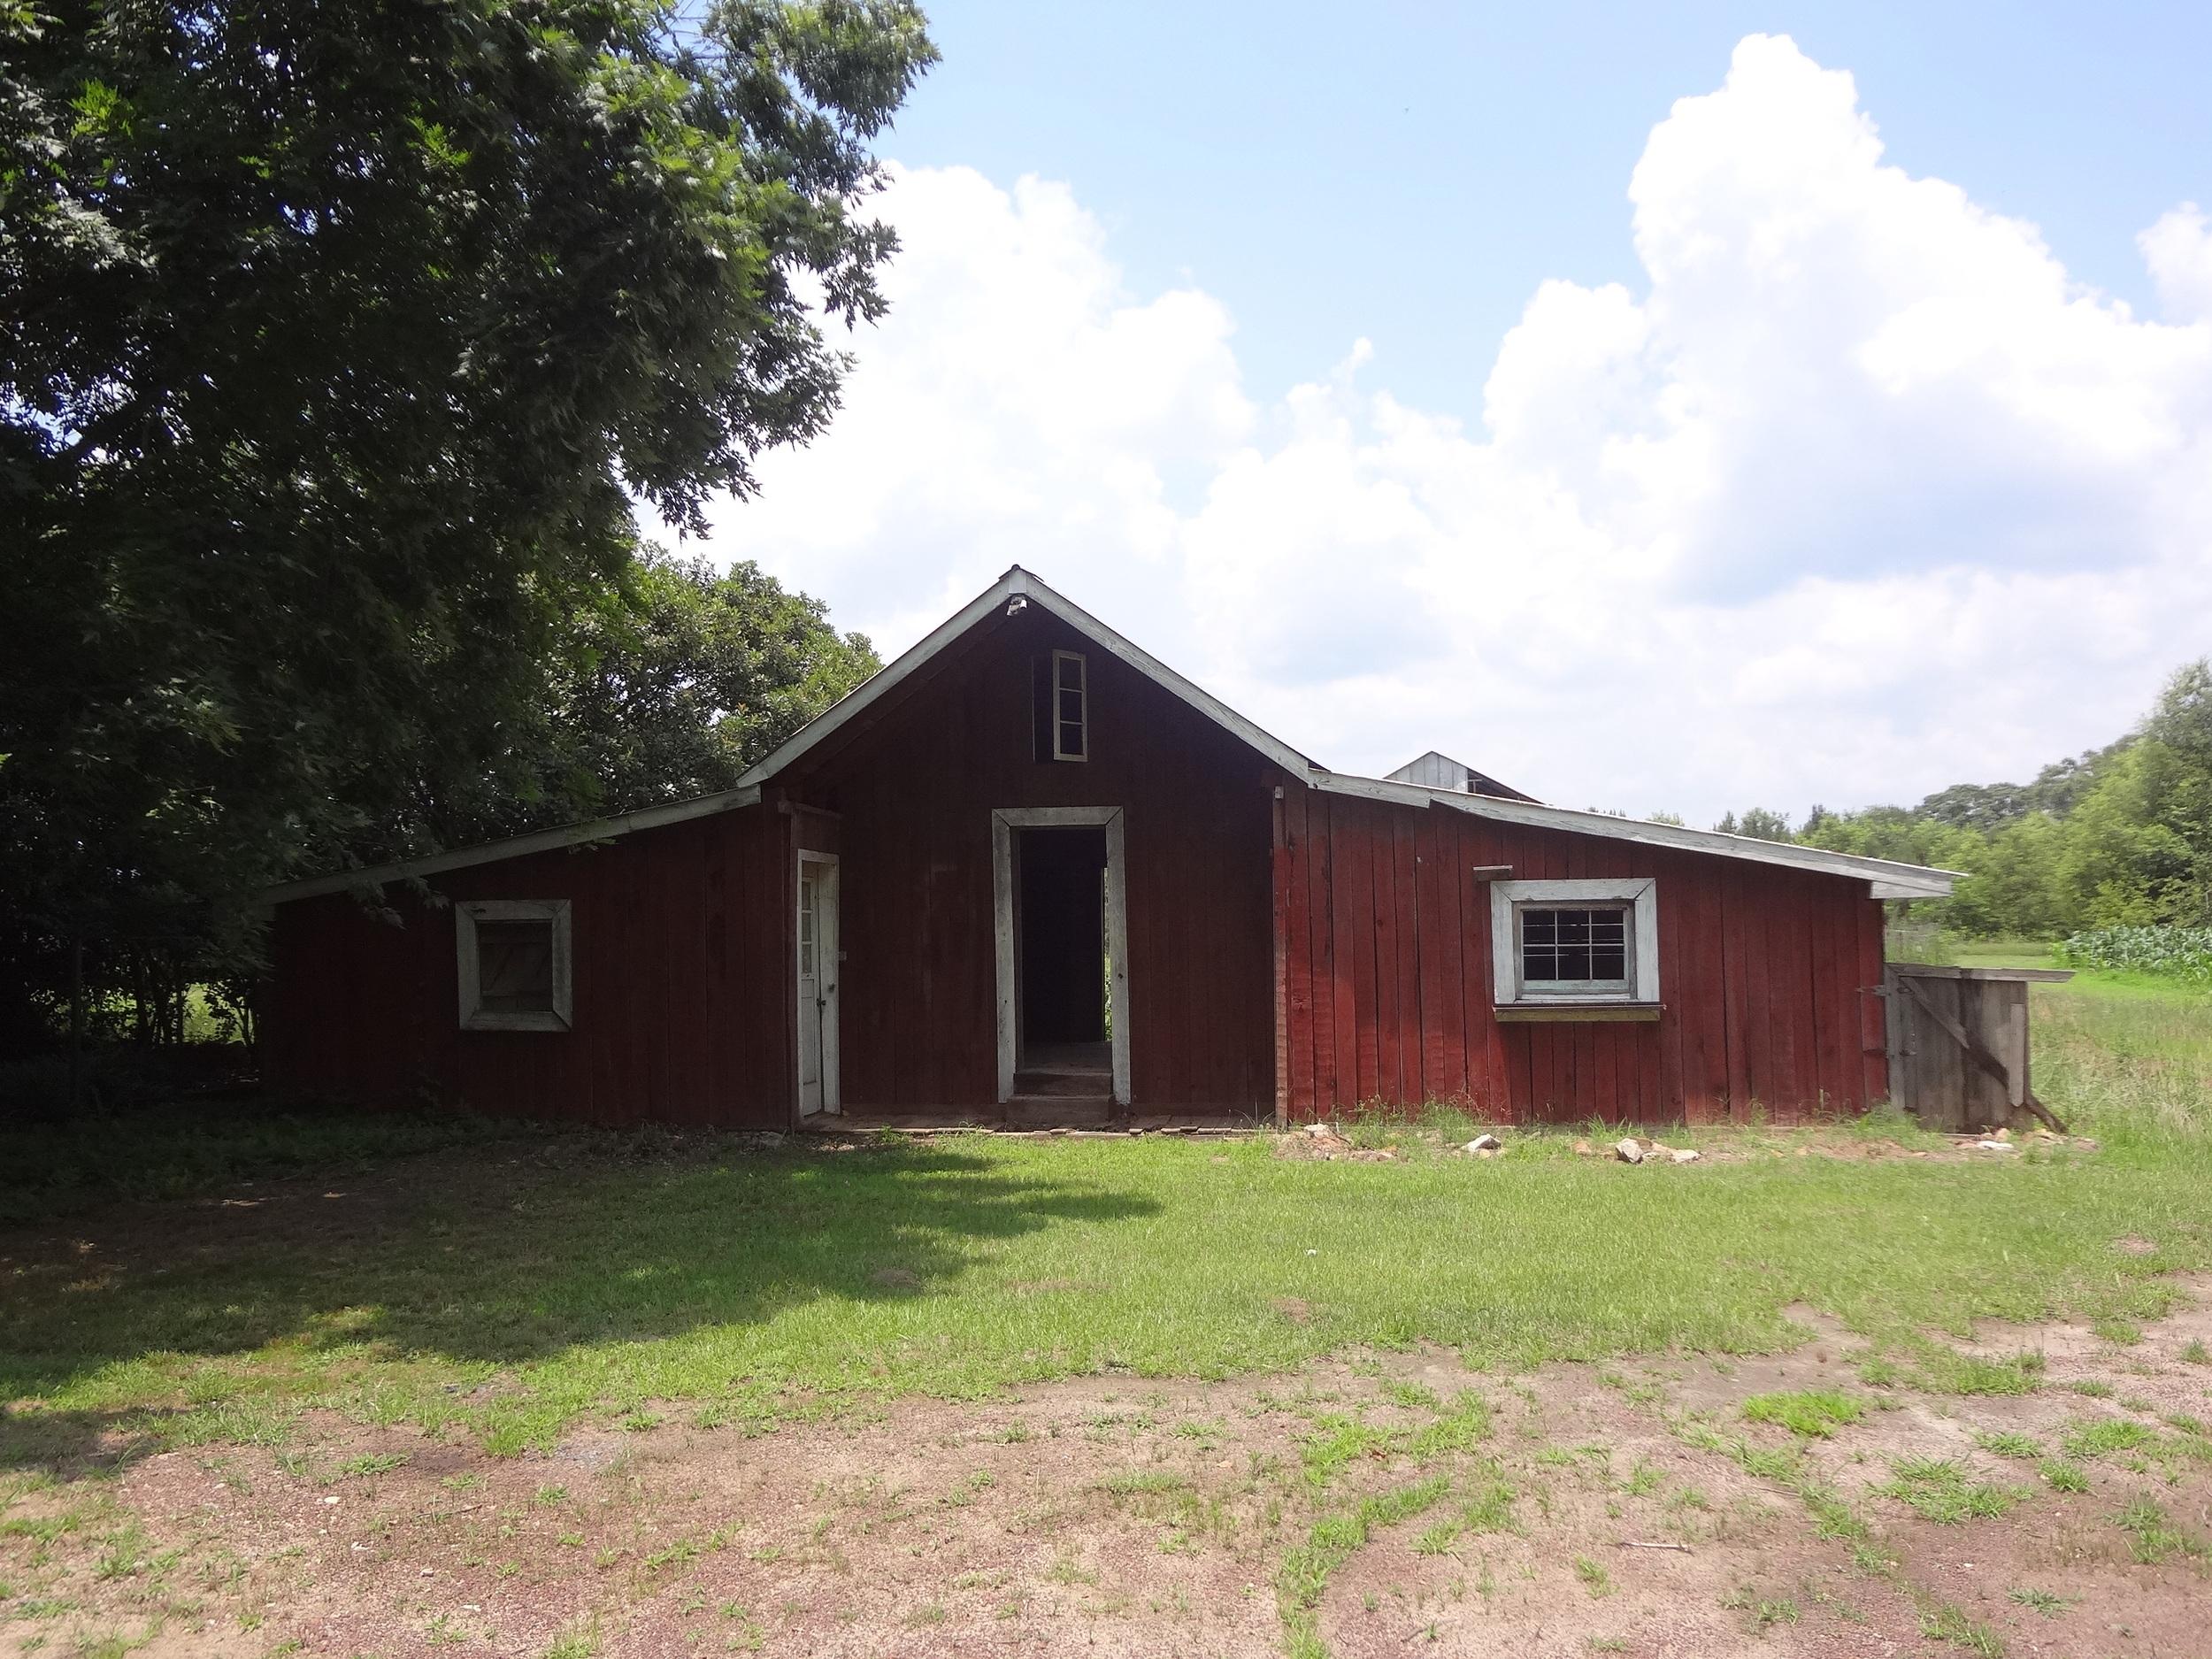 Red Rescue Barn